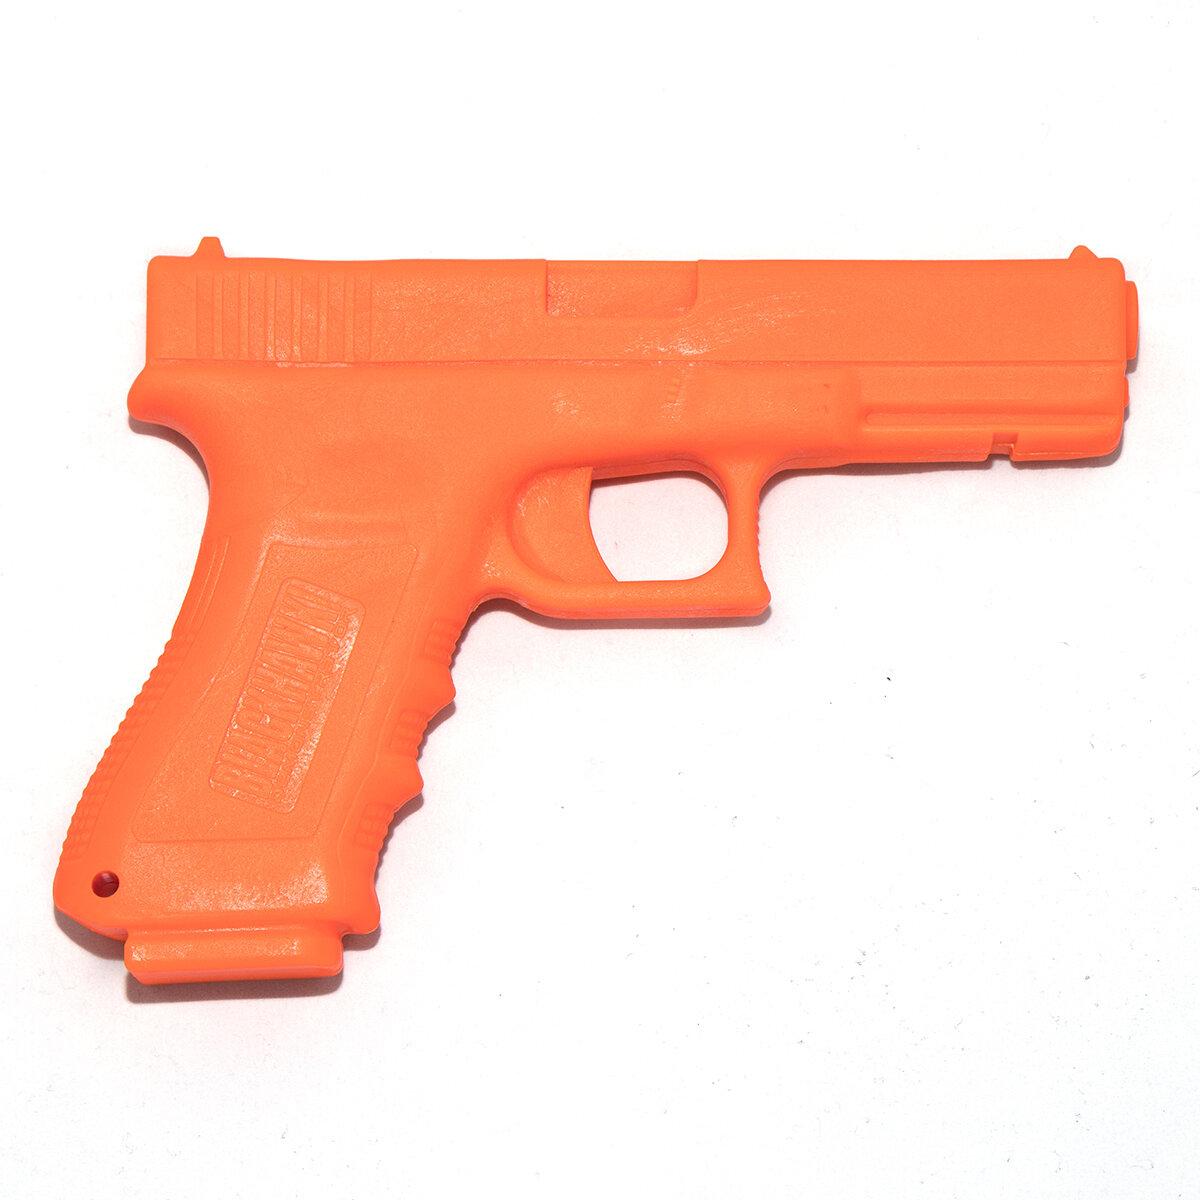 GLOCK 17 ORANGE GUN